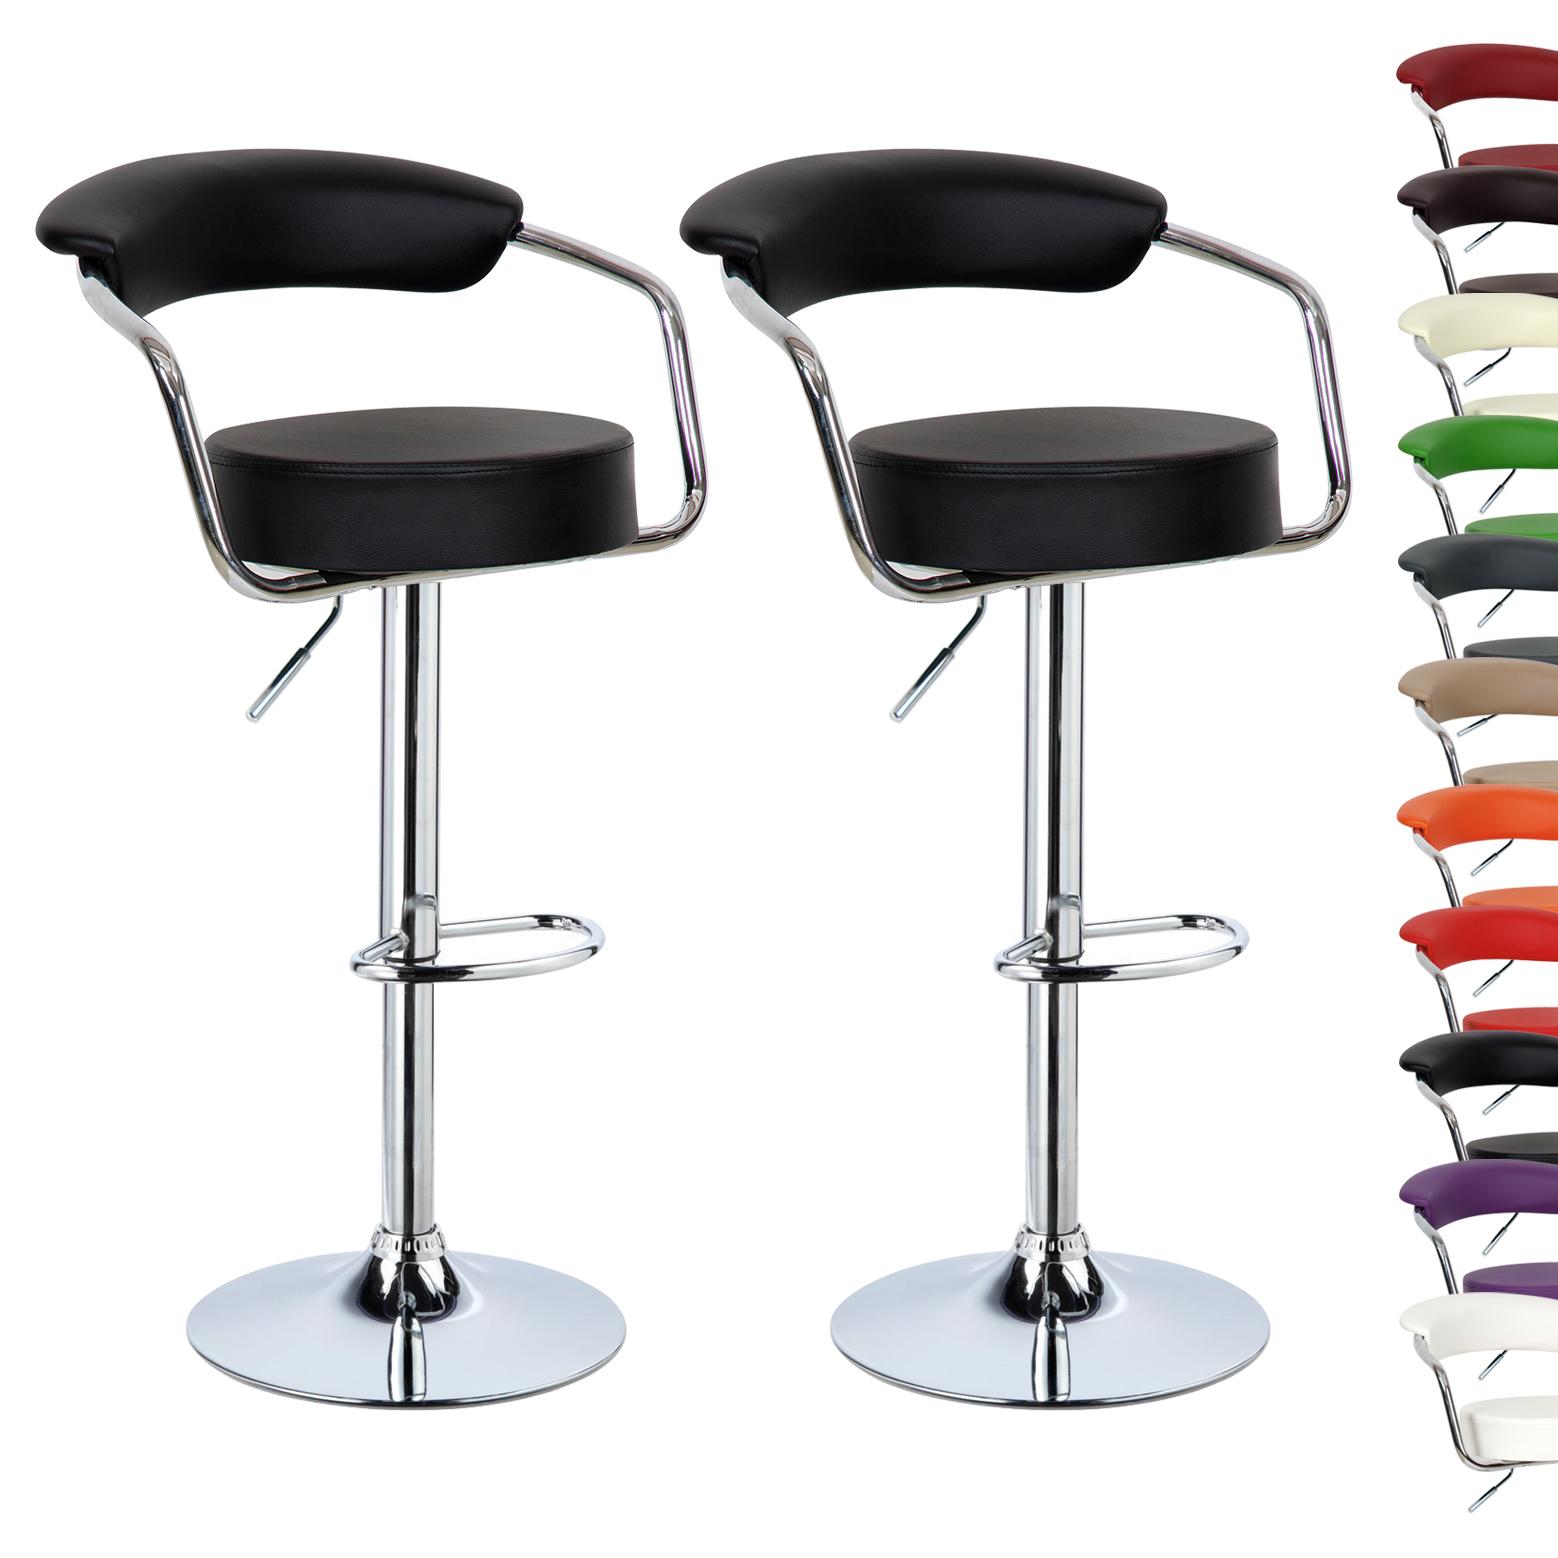 2 X Bar Stools Kitchen Breakfast Swivel Stool Chair Adjustable Faux Leather U052 Ebay